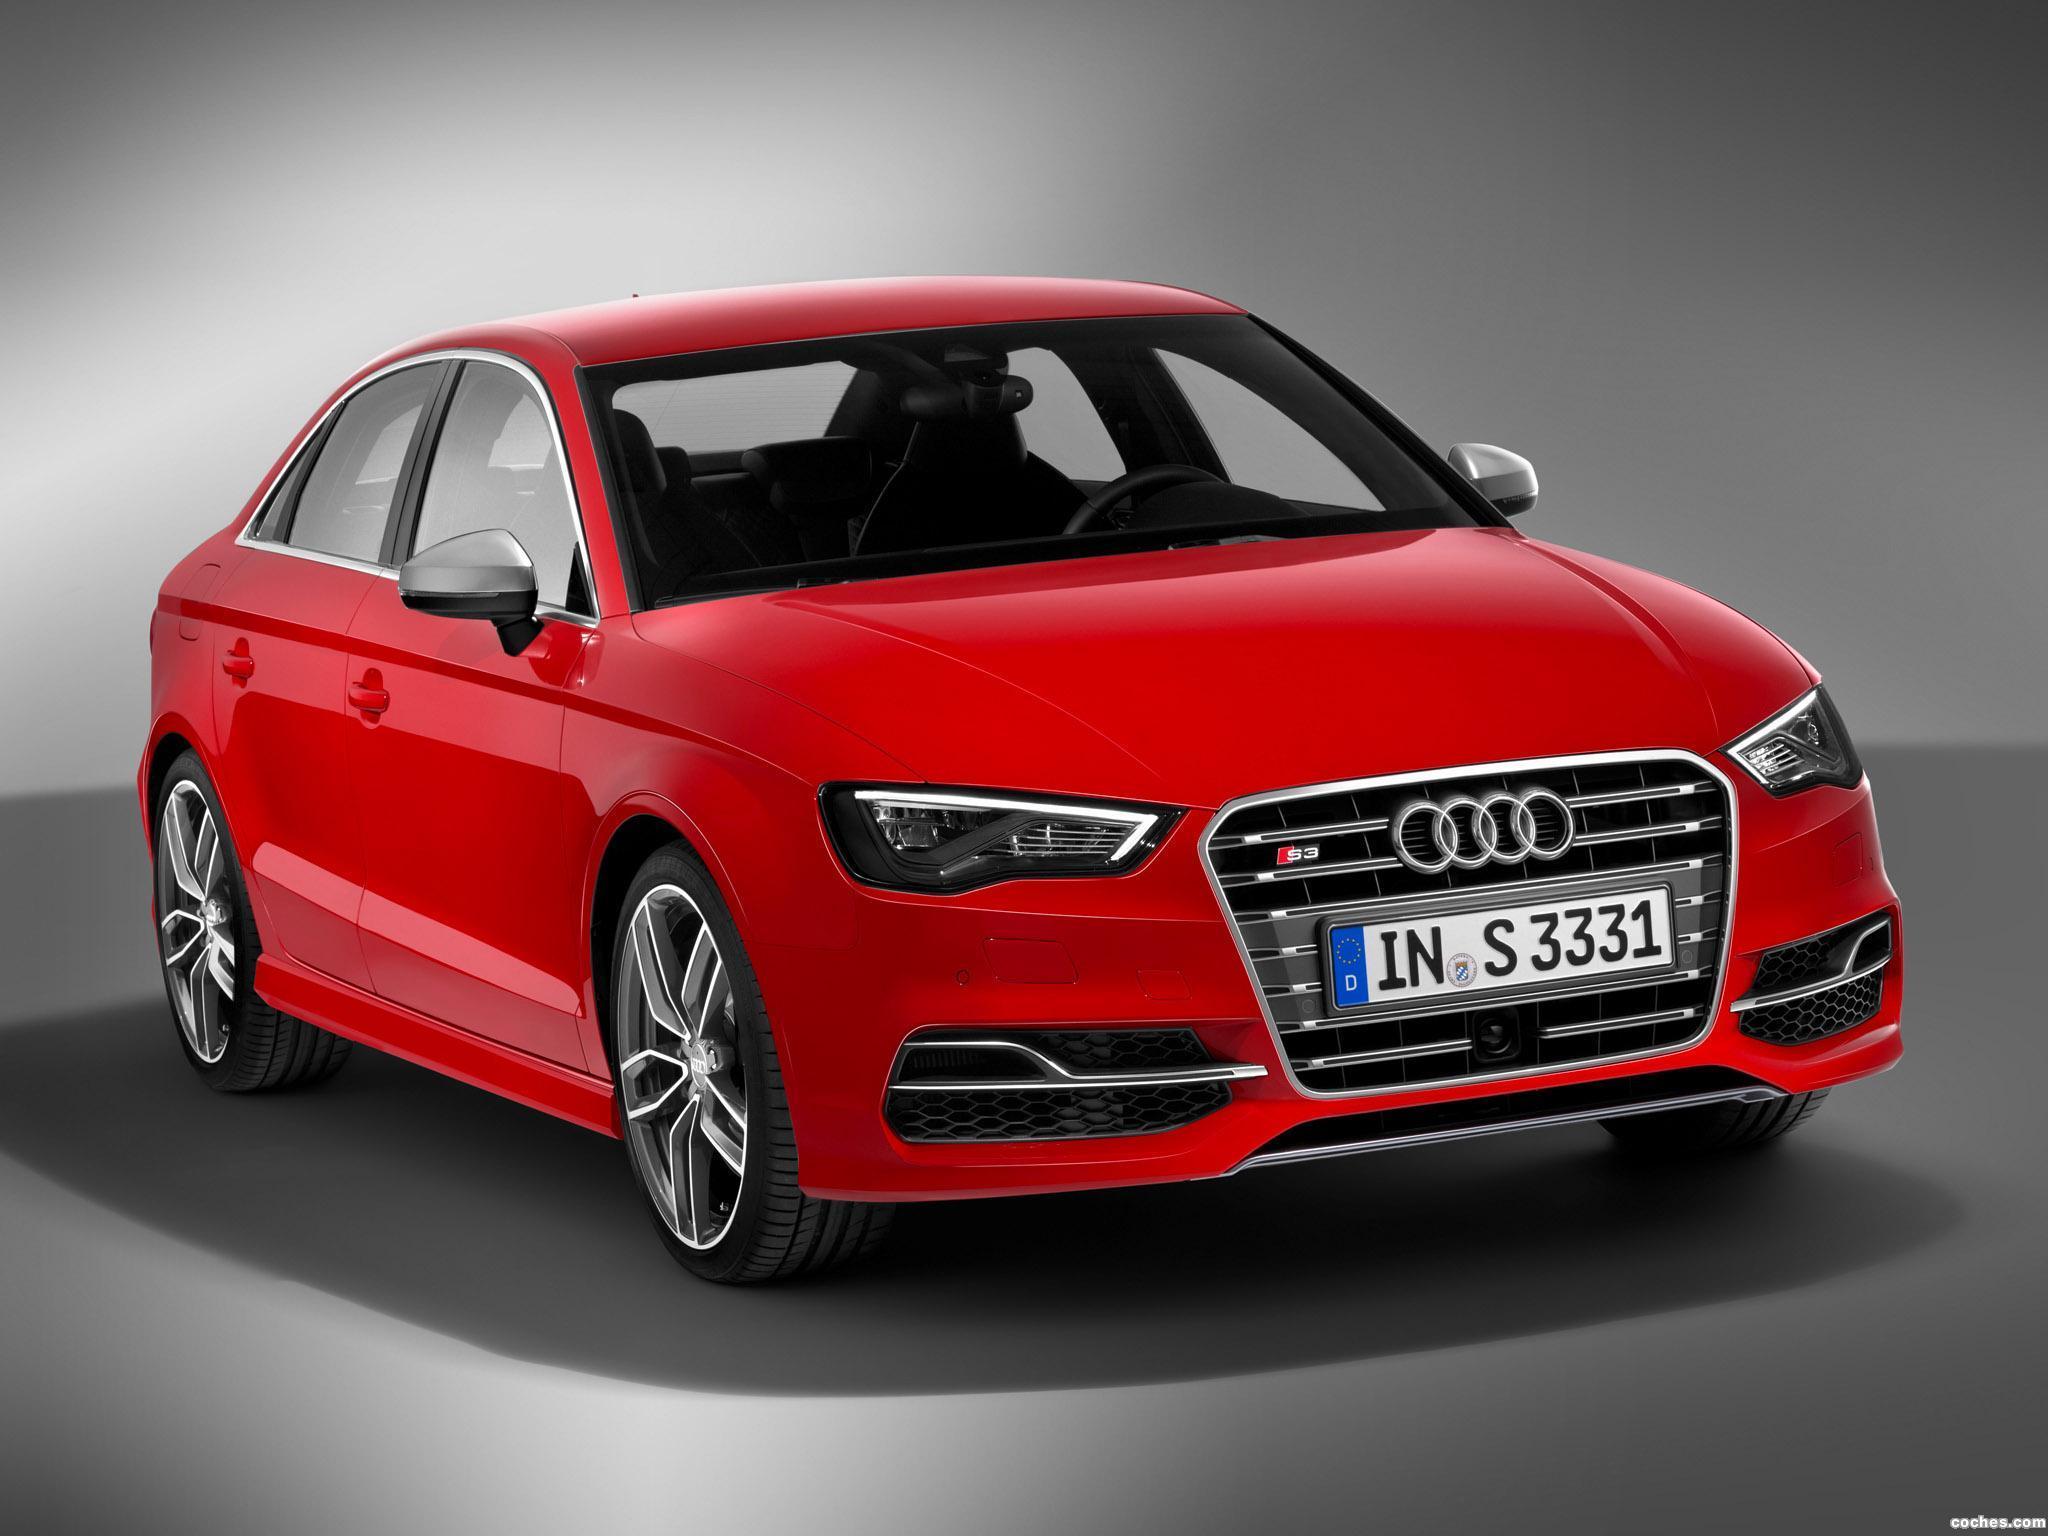 Foto 0 de Audi S3 Sedan 2013